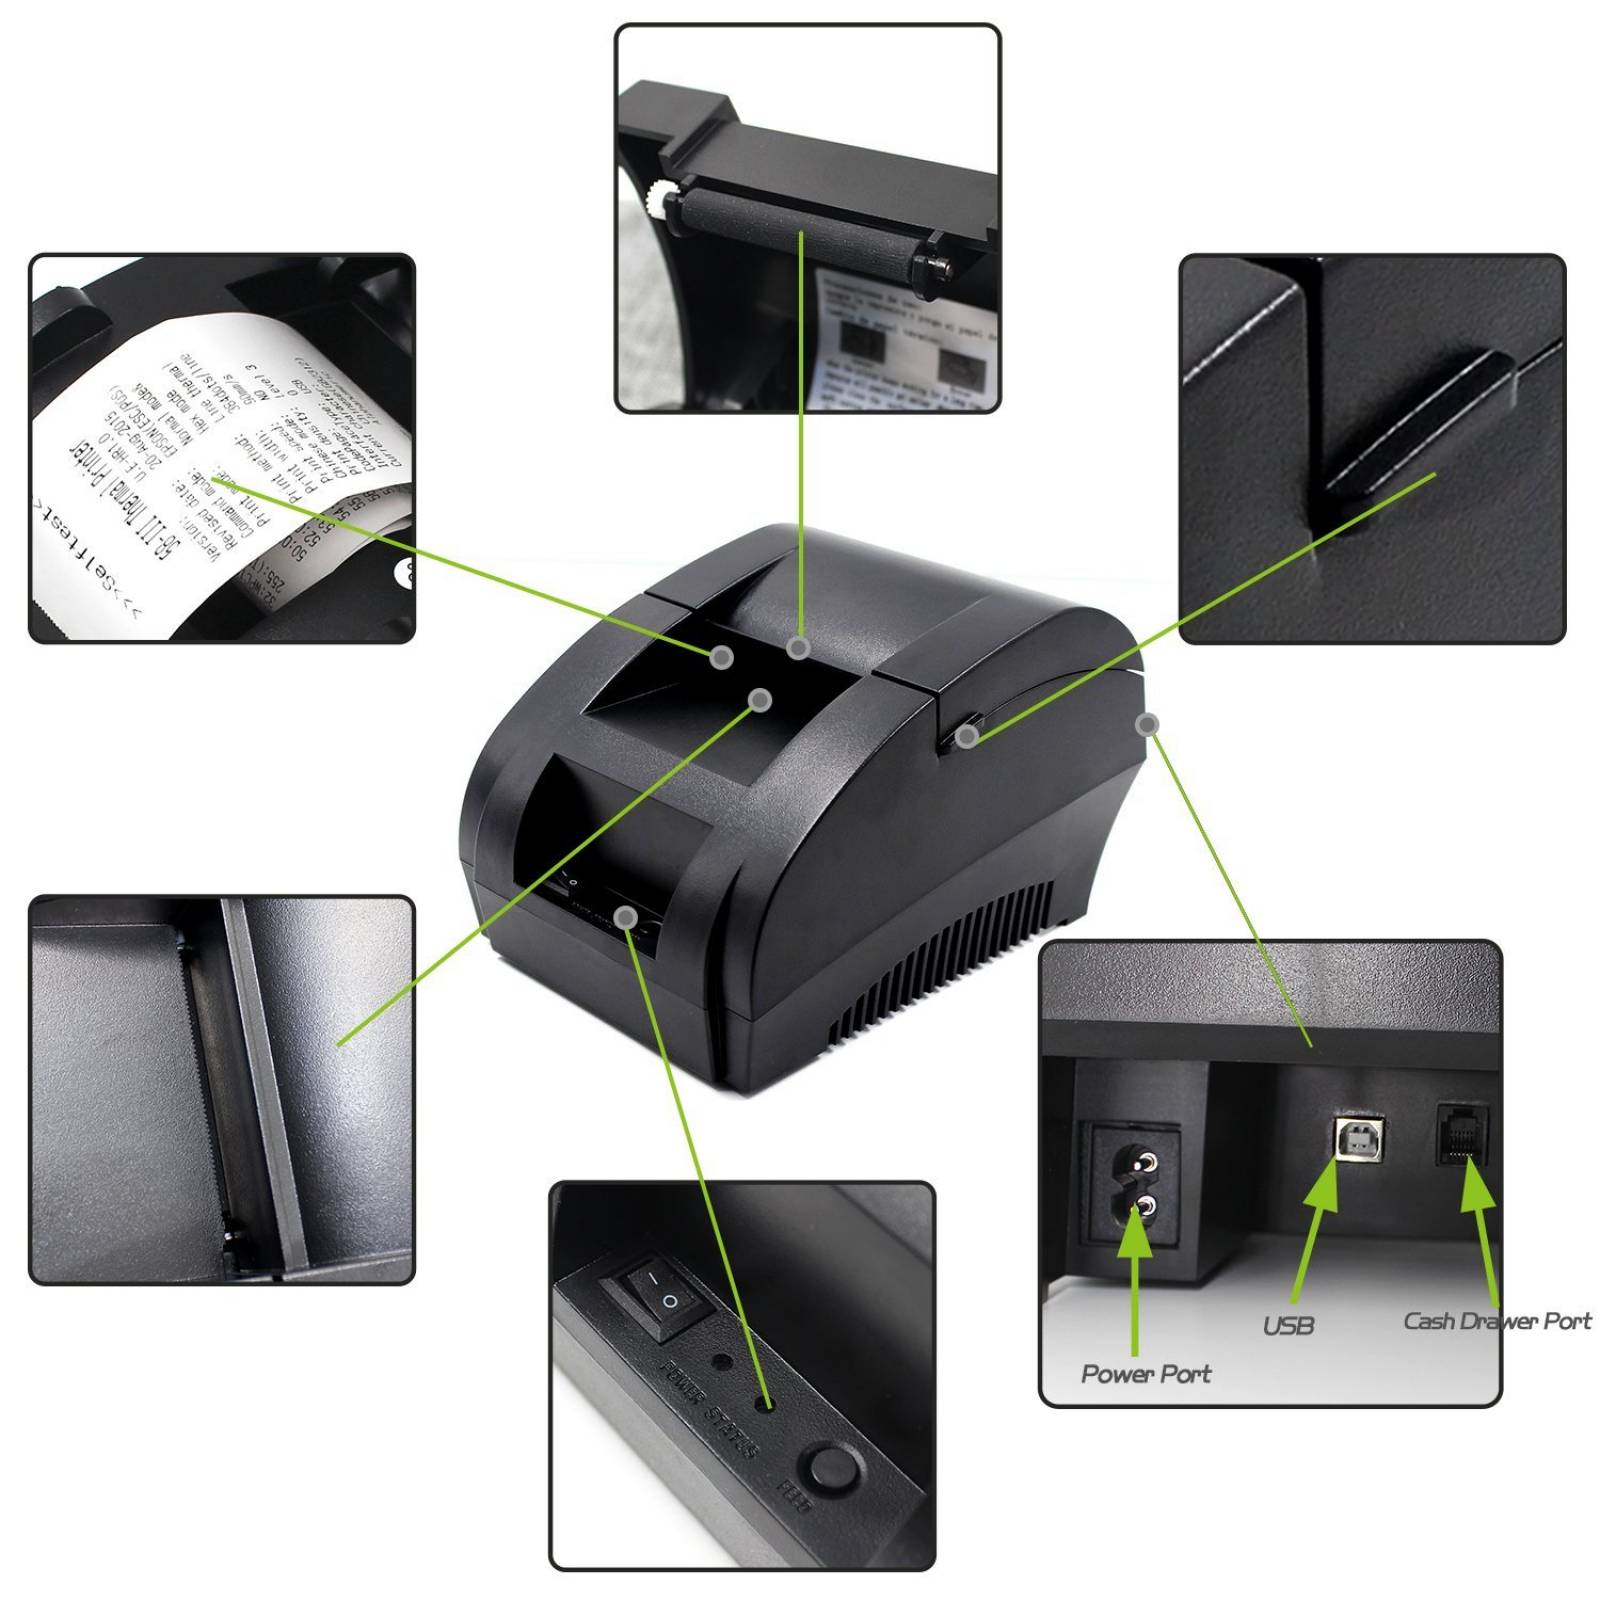 58MM USB recibo térmico PrinterSymcode alta velocidad impres